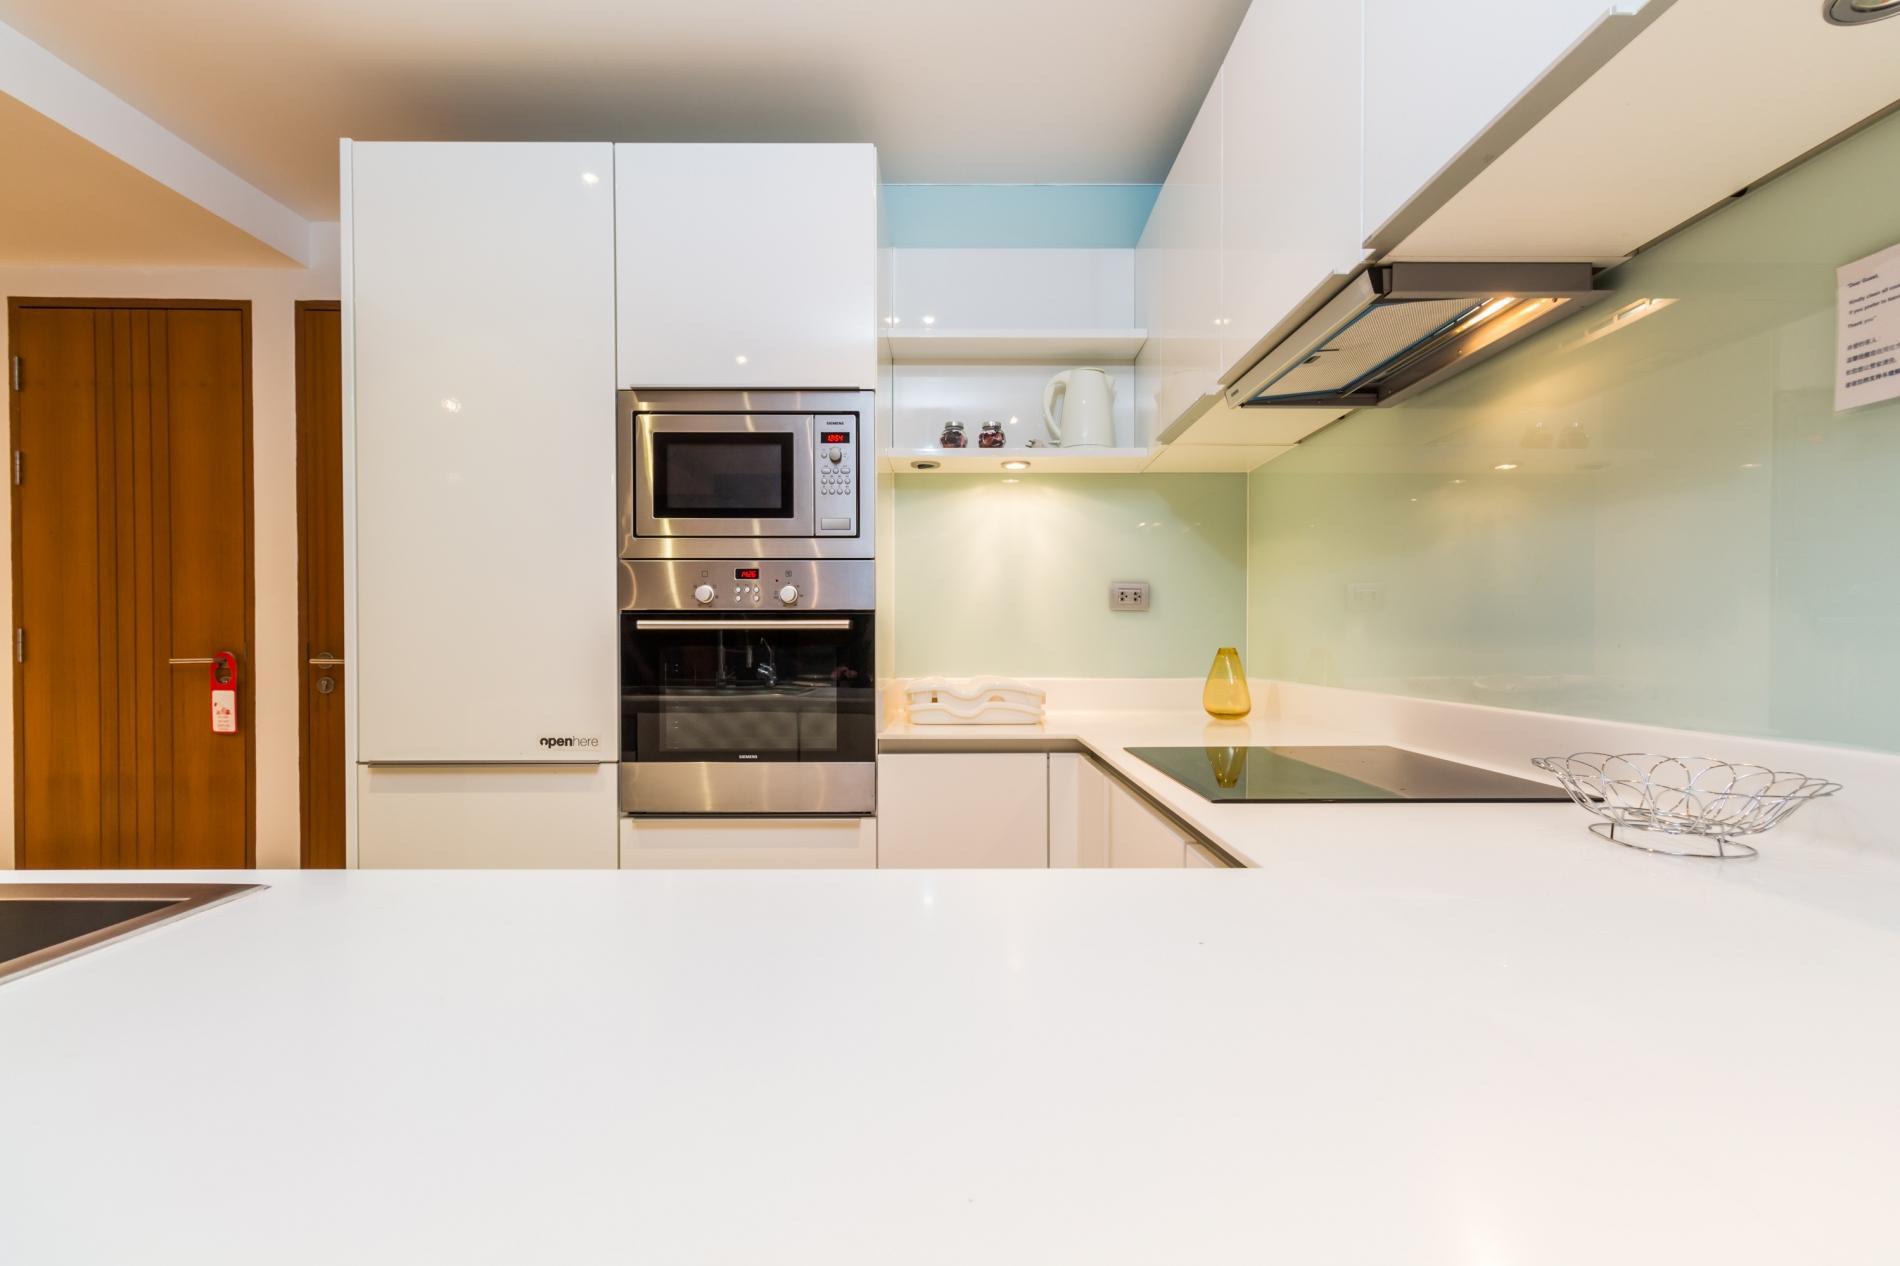 Apartment Privilege12 - Seaview 3 bedroom luxury apartment on Kalim bay photo 20176144